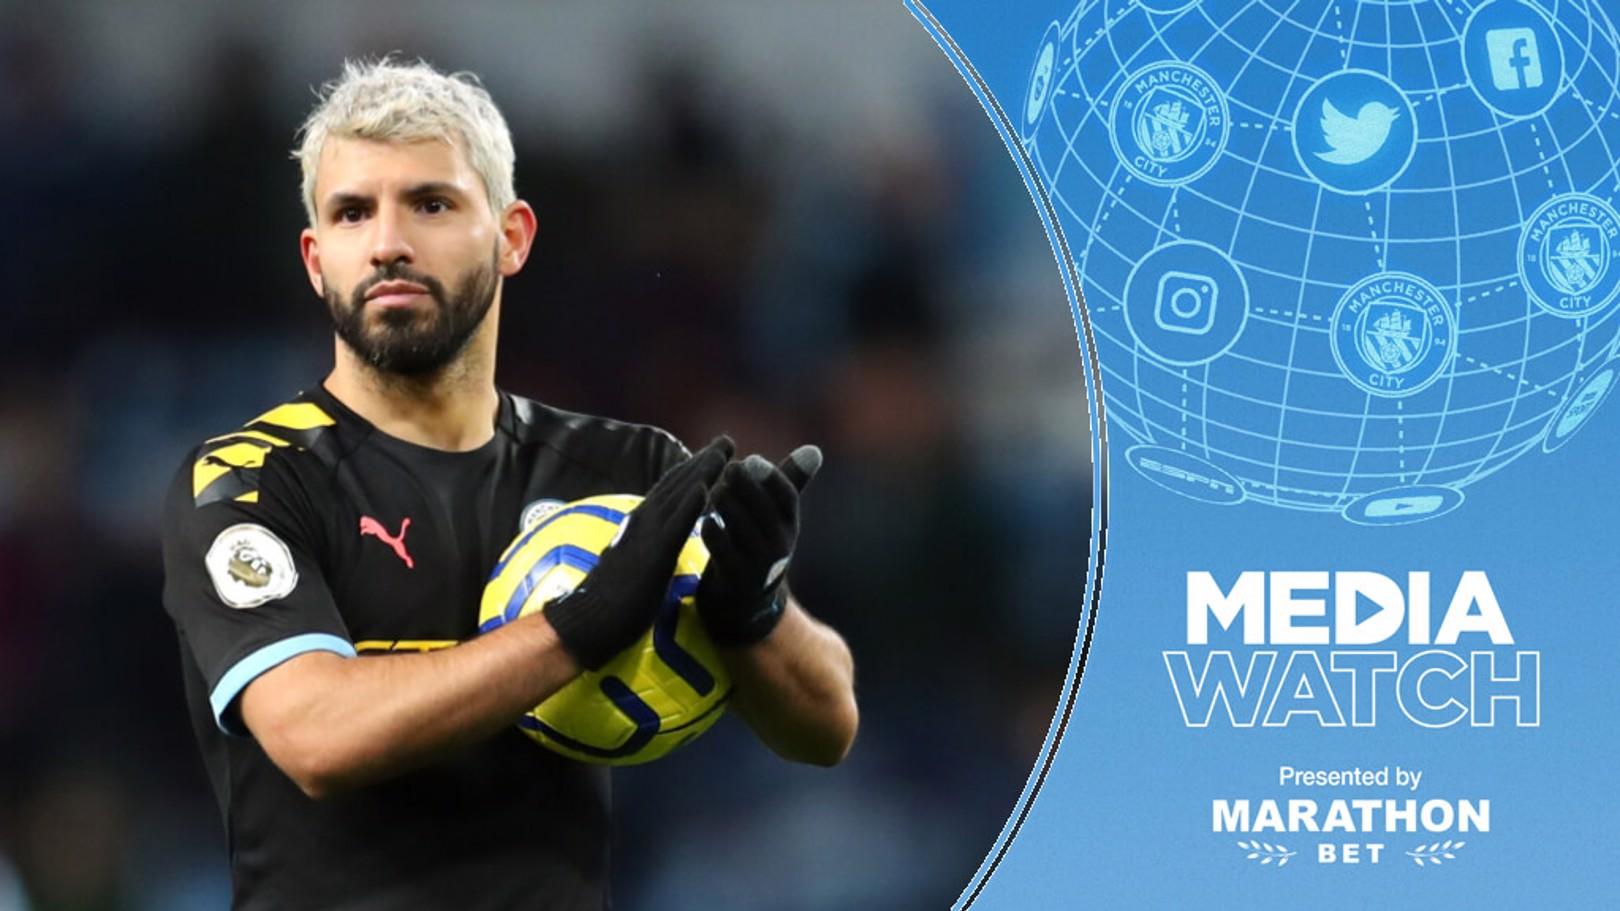 KUN TARGET: Sergio Aguero has his sights set on breaking more Premier League records